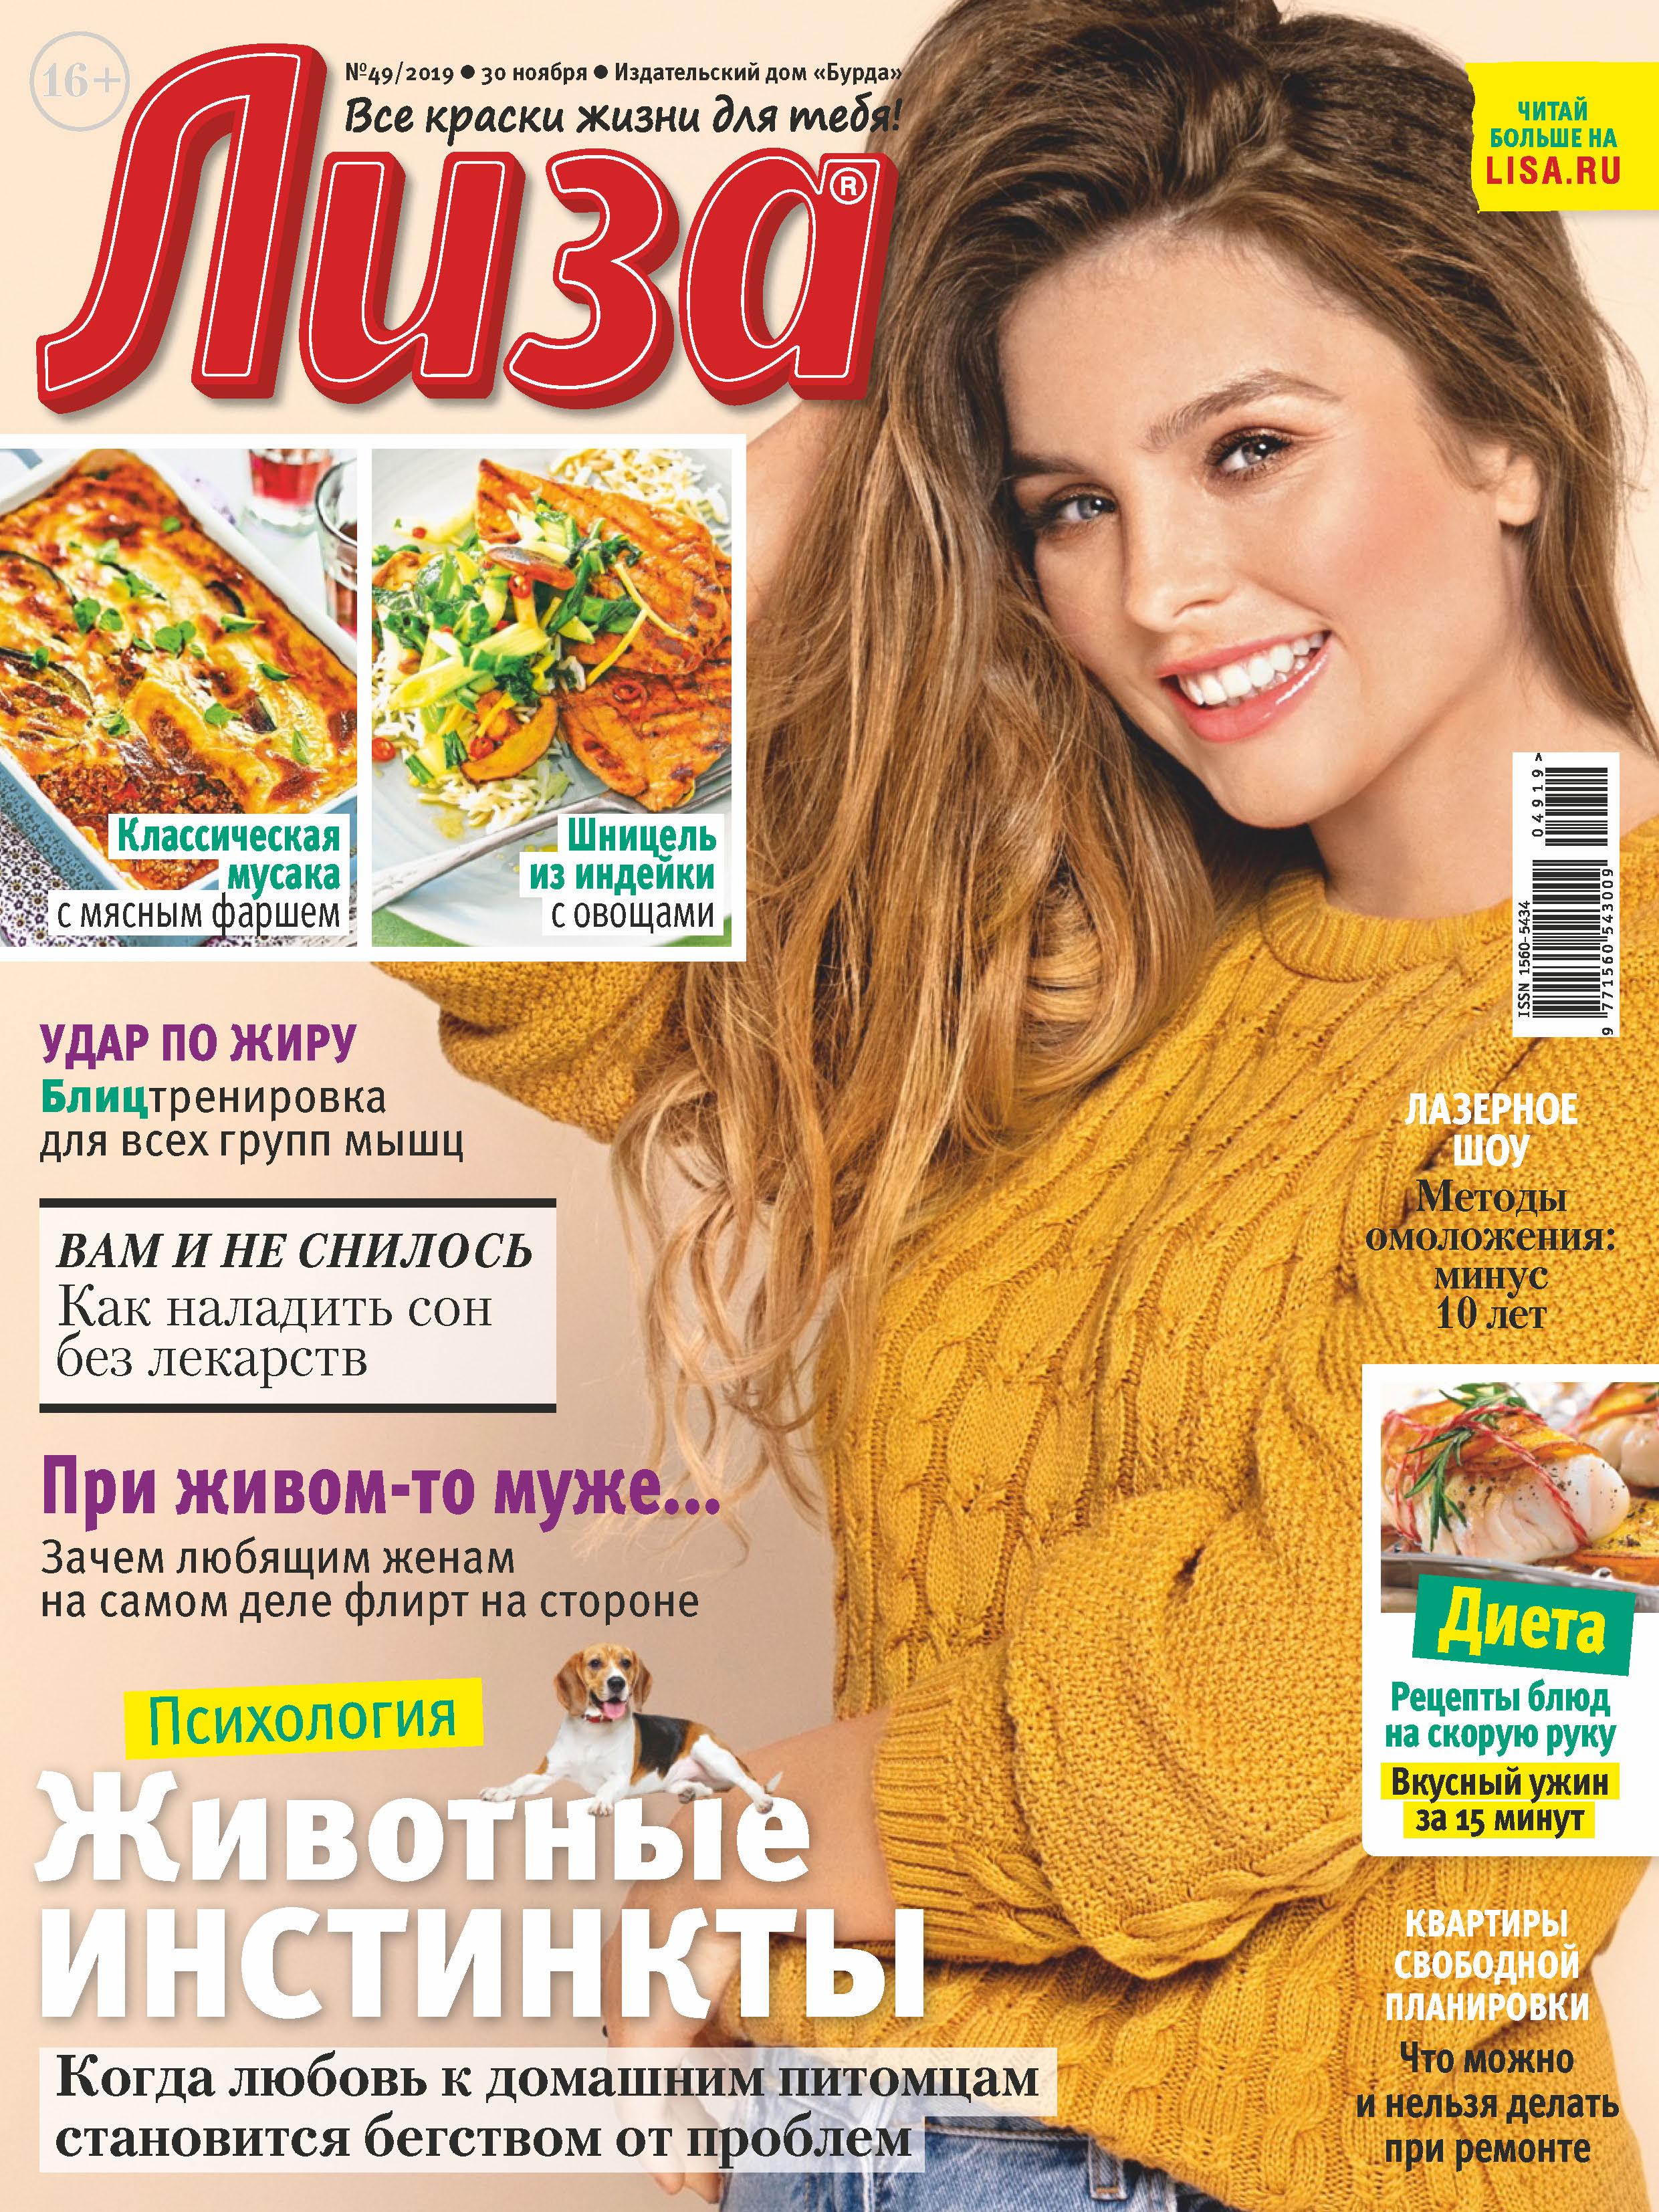 Журнал «Лиза» №49/2019